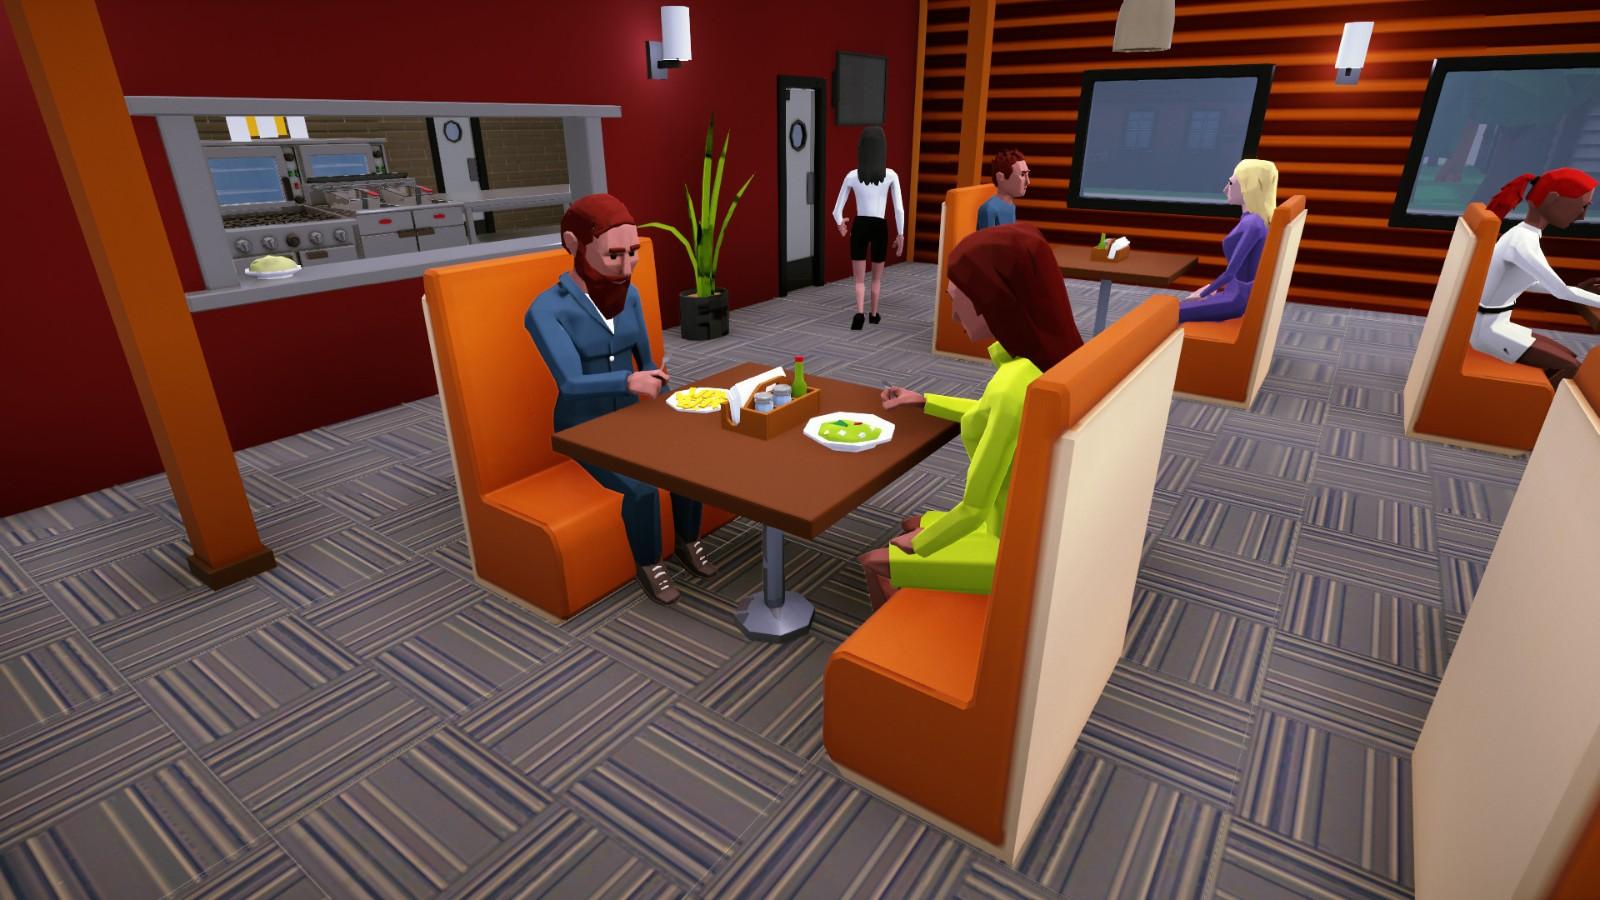 餐廳管理模擬遊戲《Recipe for Disaster》上架Steam